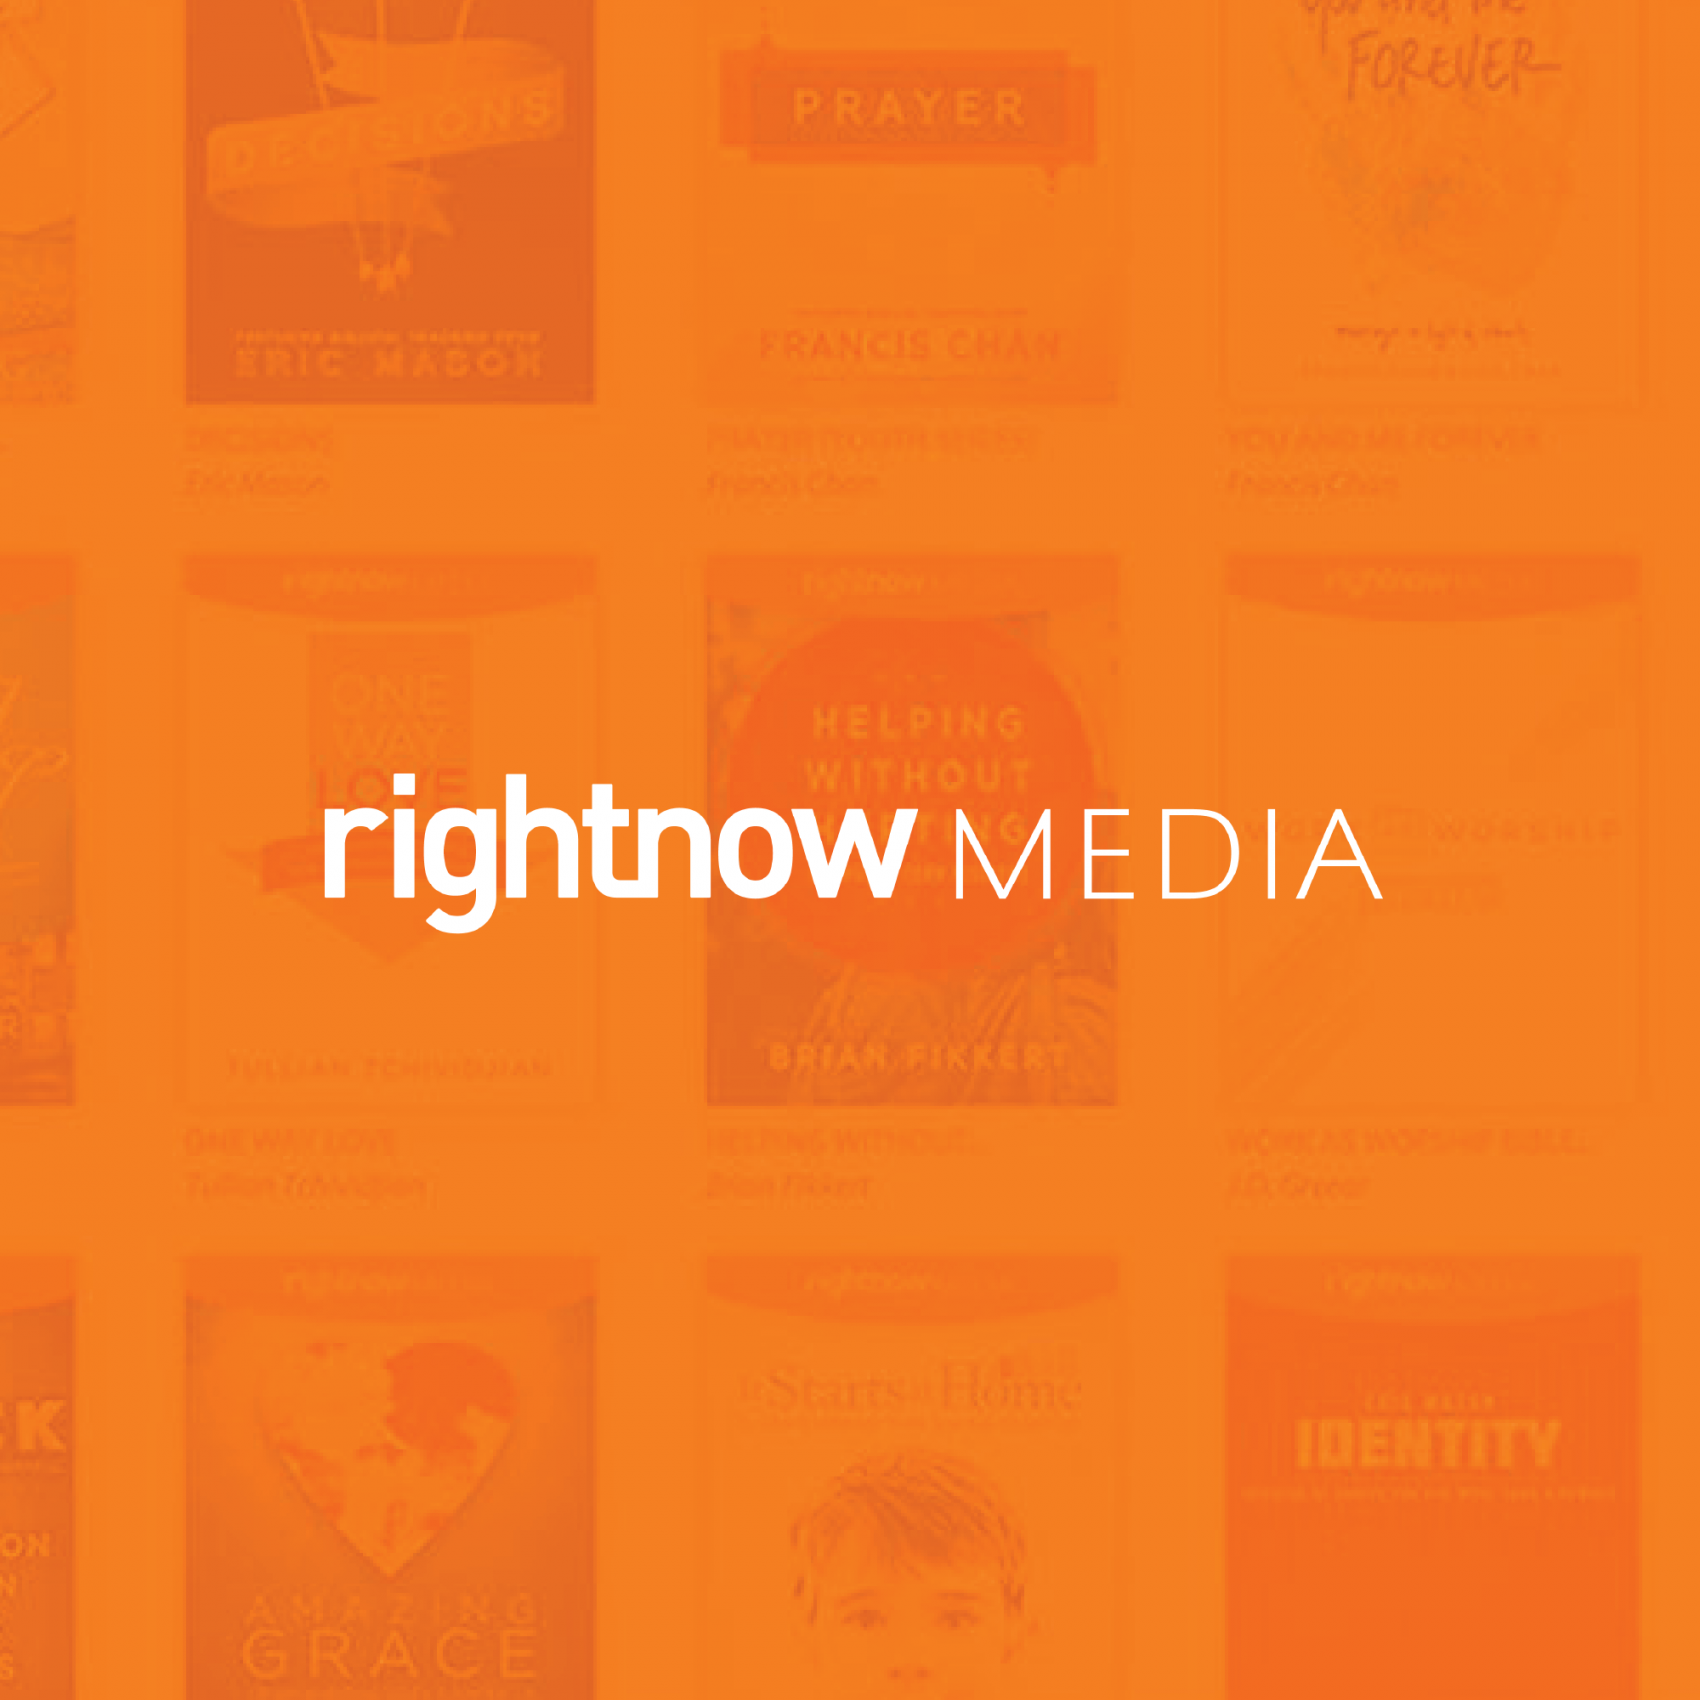 rightnowmedia_1x1_1700_1700_c1.png